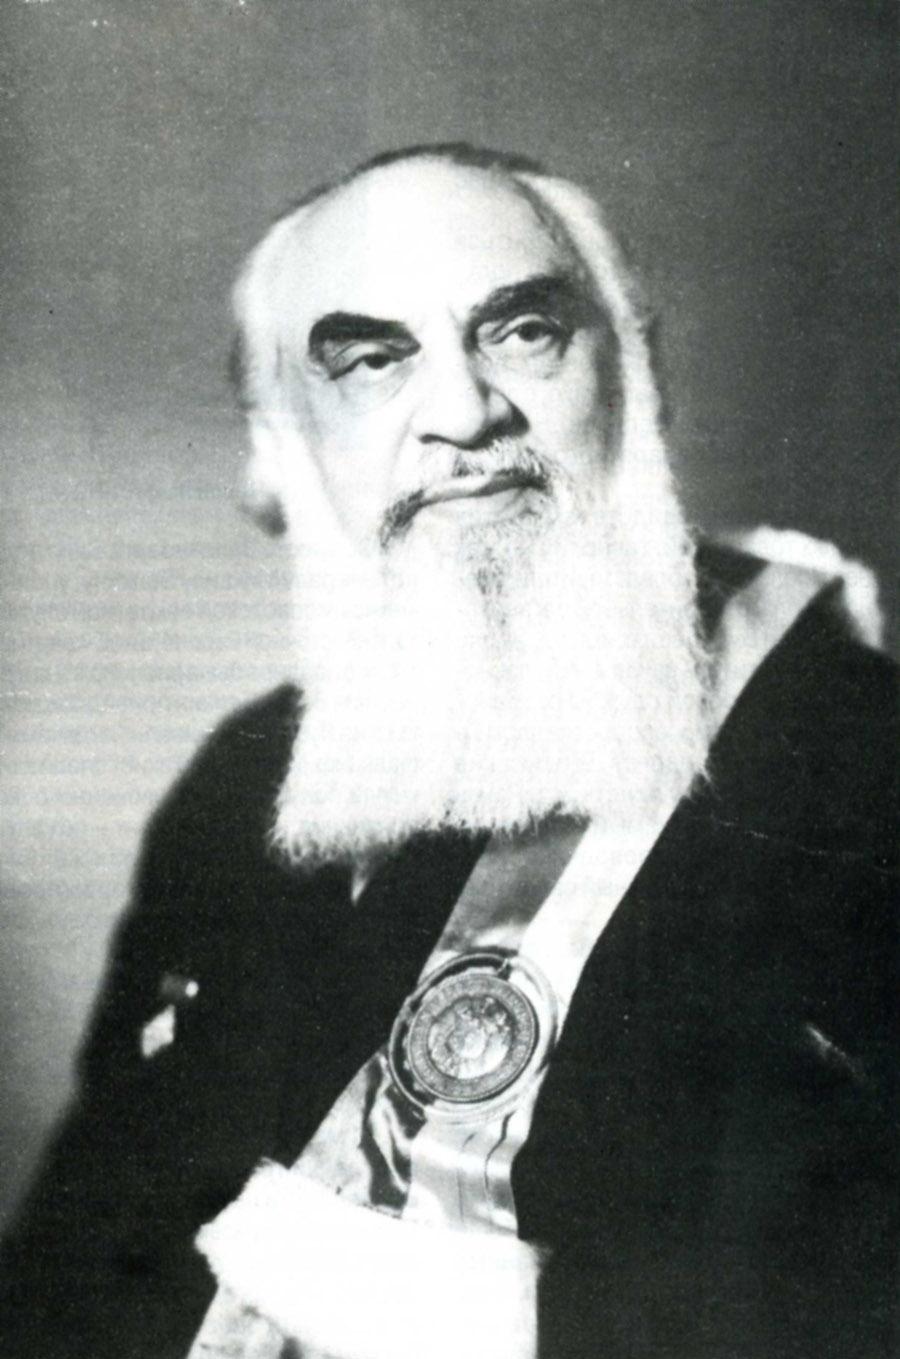 Пионер космонавтики. Ари Штернфельд 3